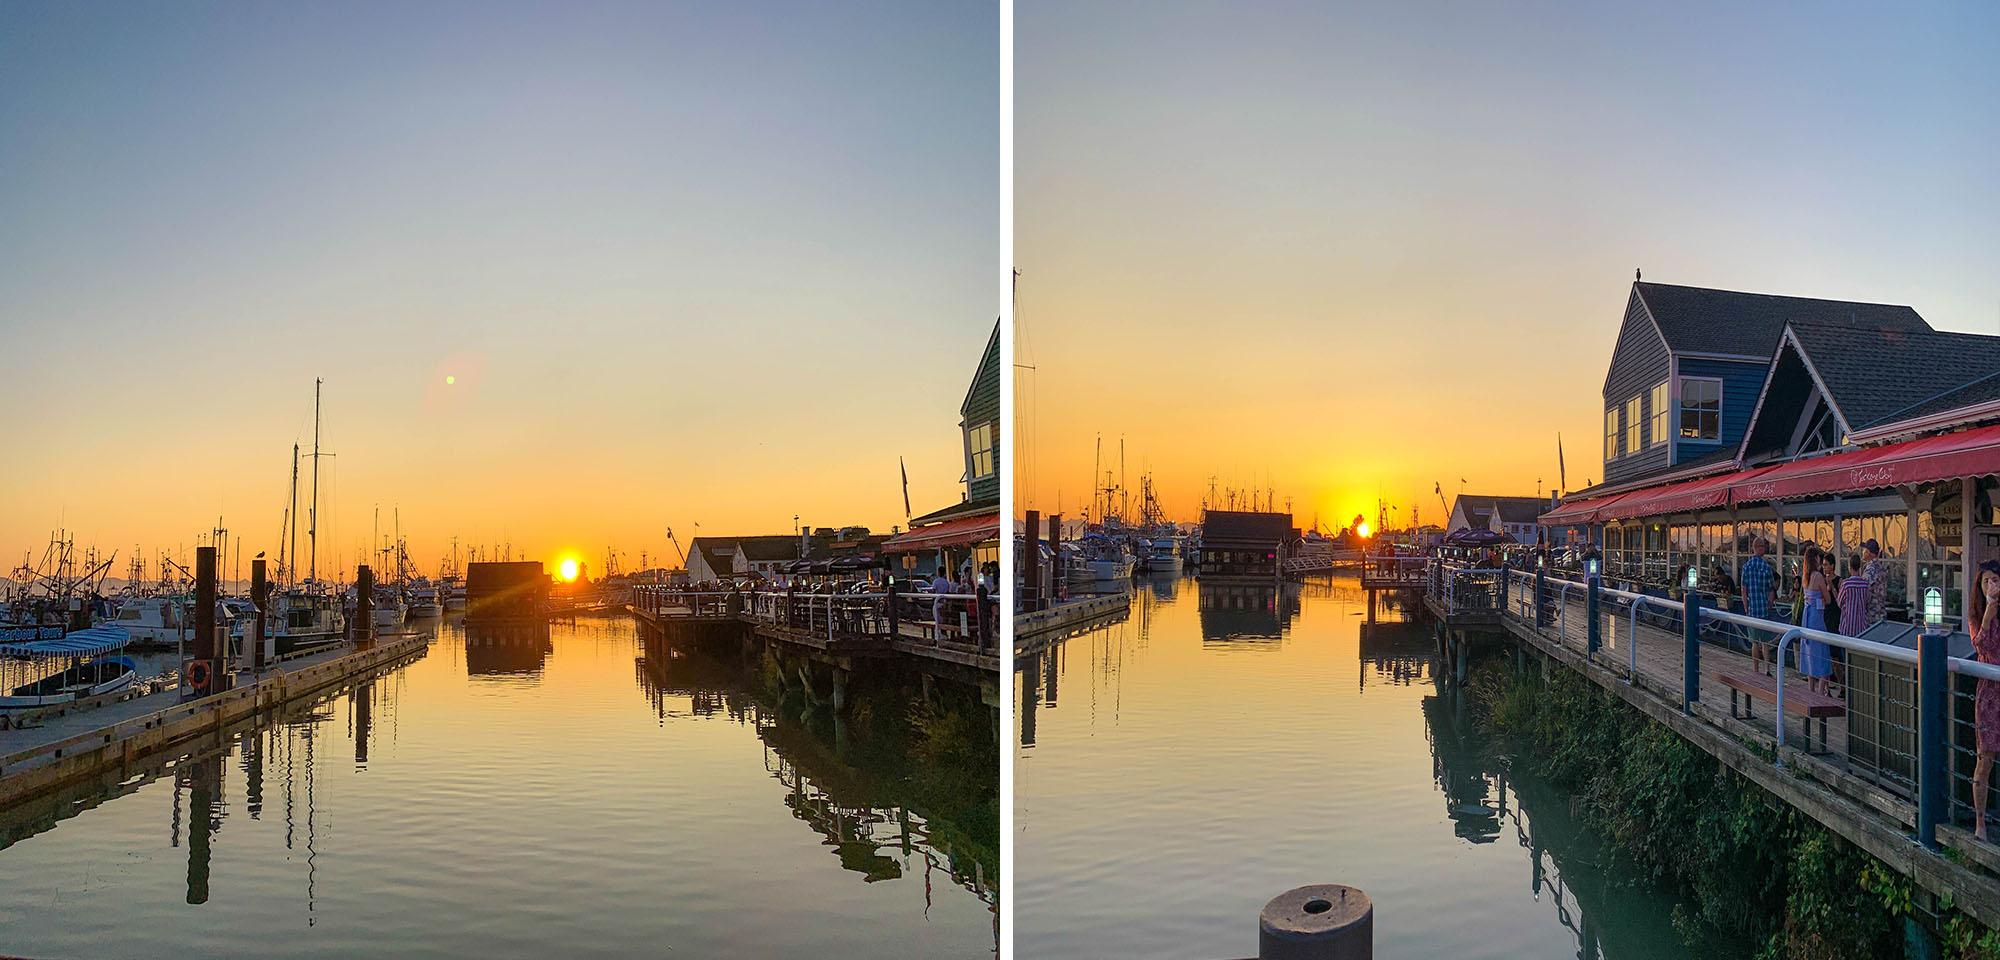 Steveston Fisherman's wharf review